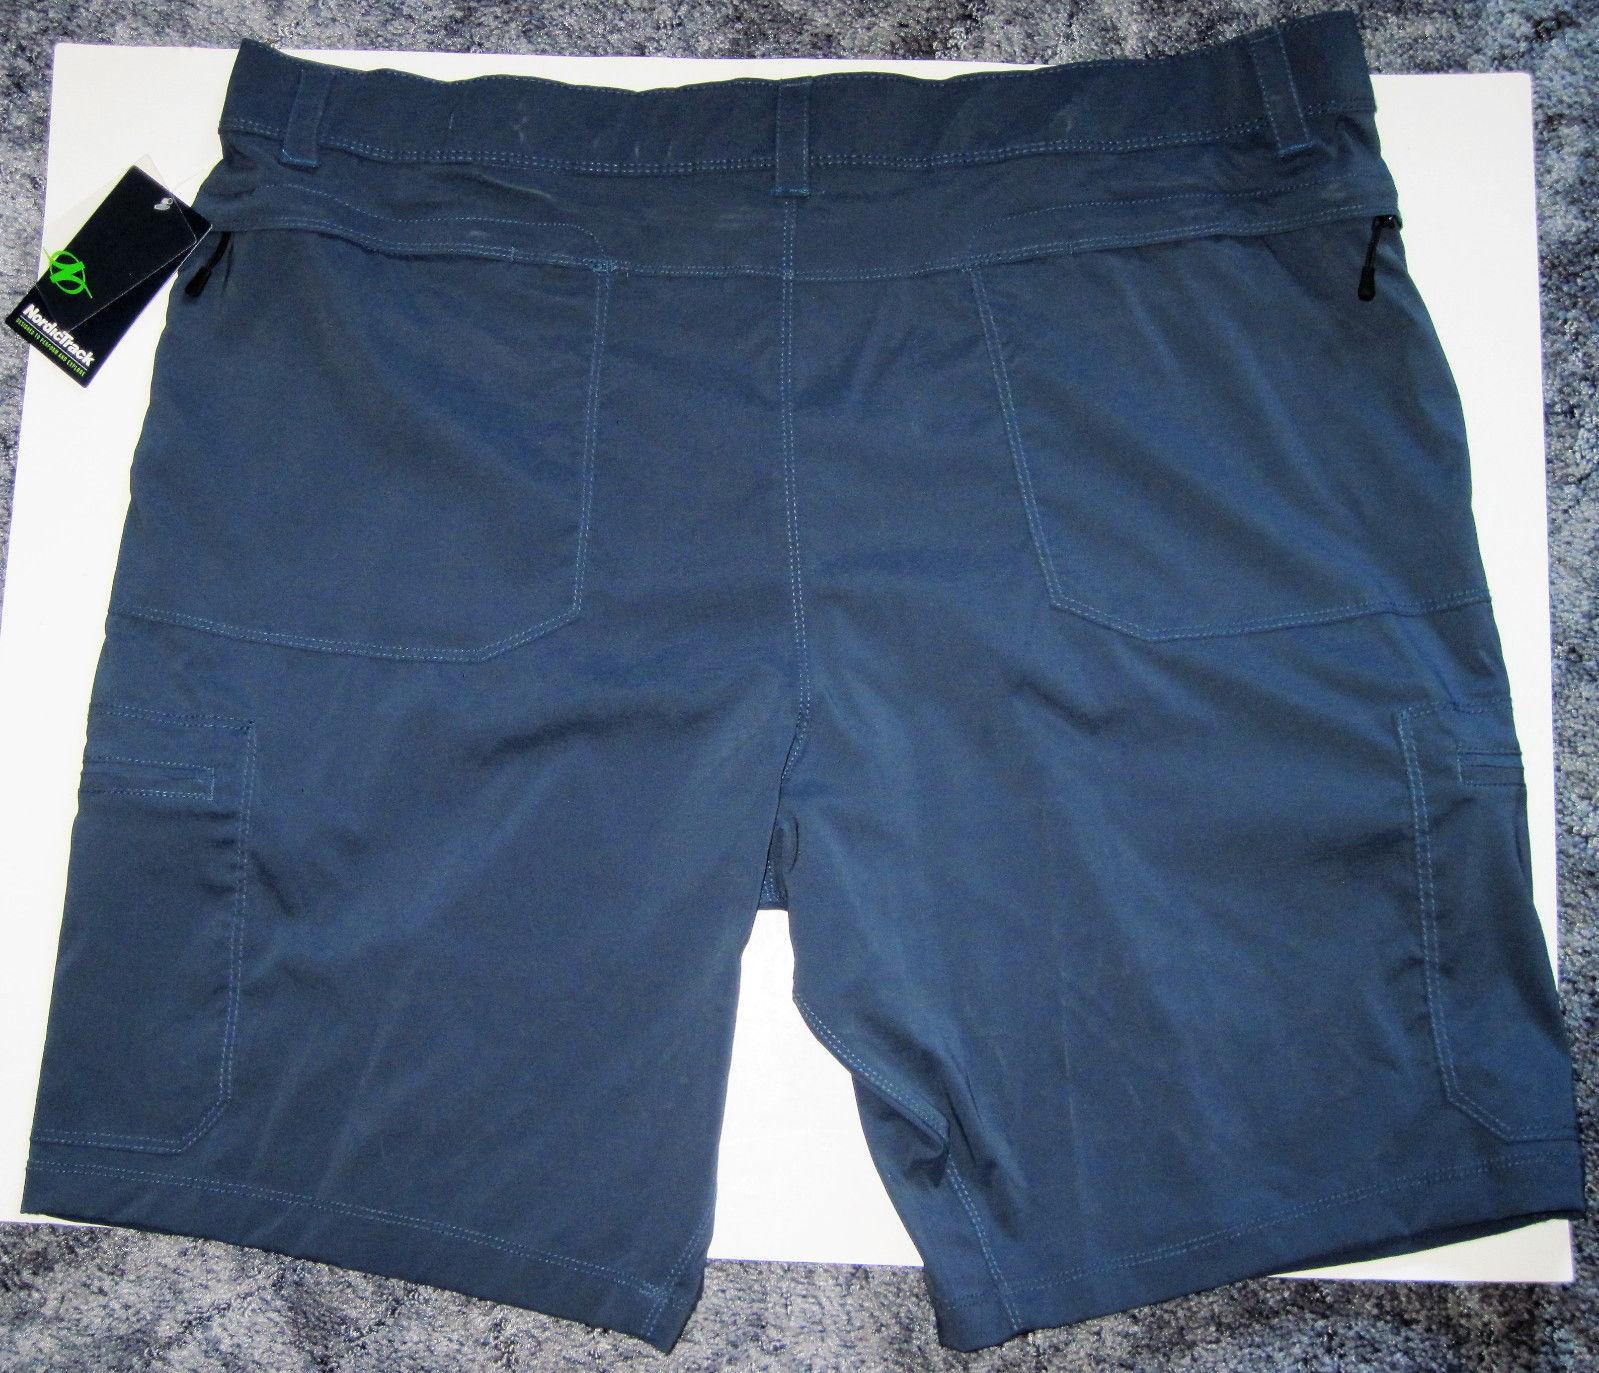 NWT NordicTrack Cargo Shorts Navy Blue 6 pockets Light Polyester Spandex flat 42